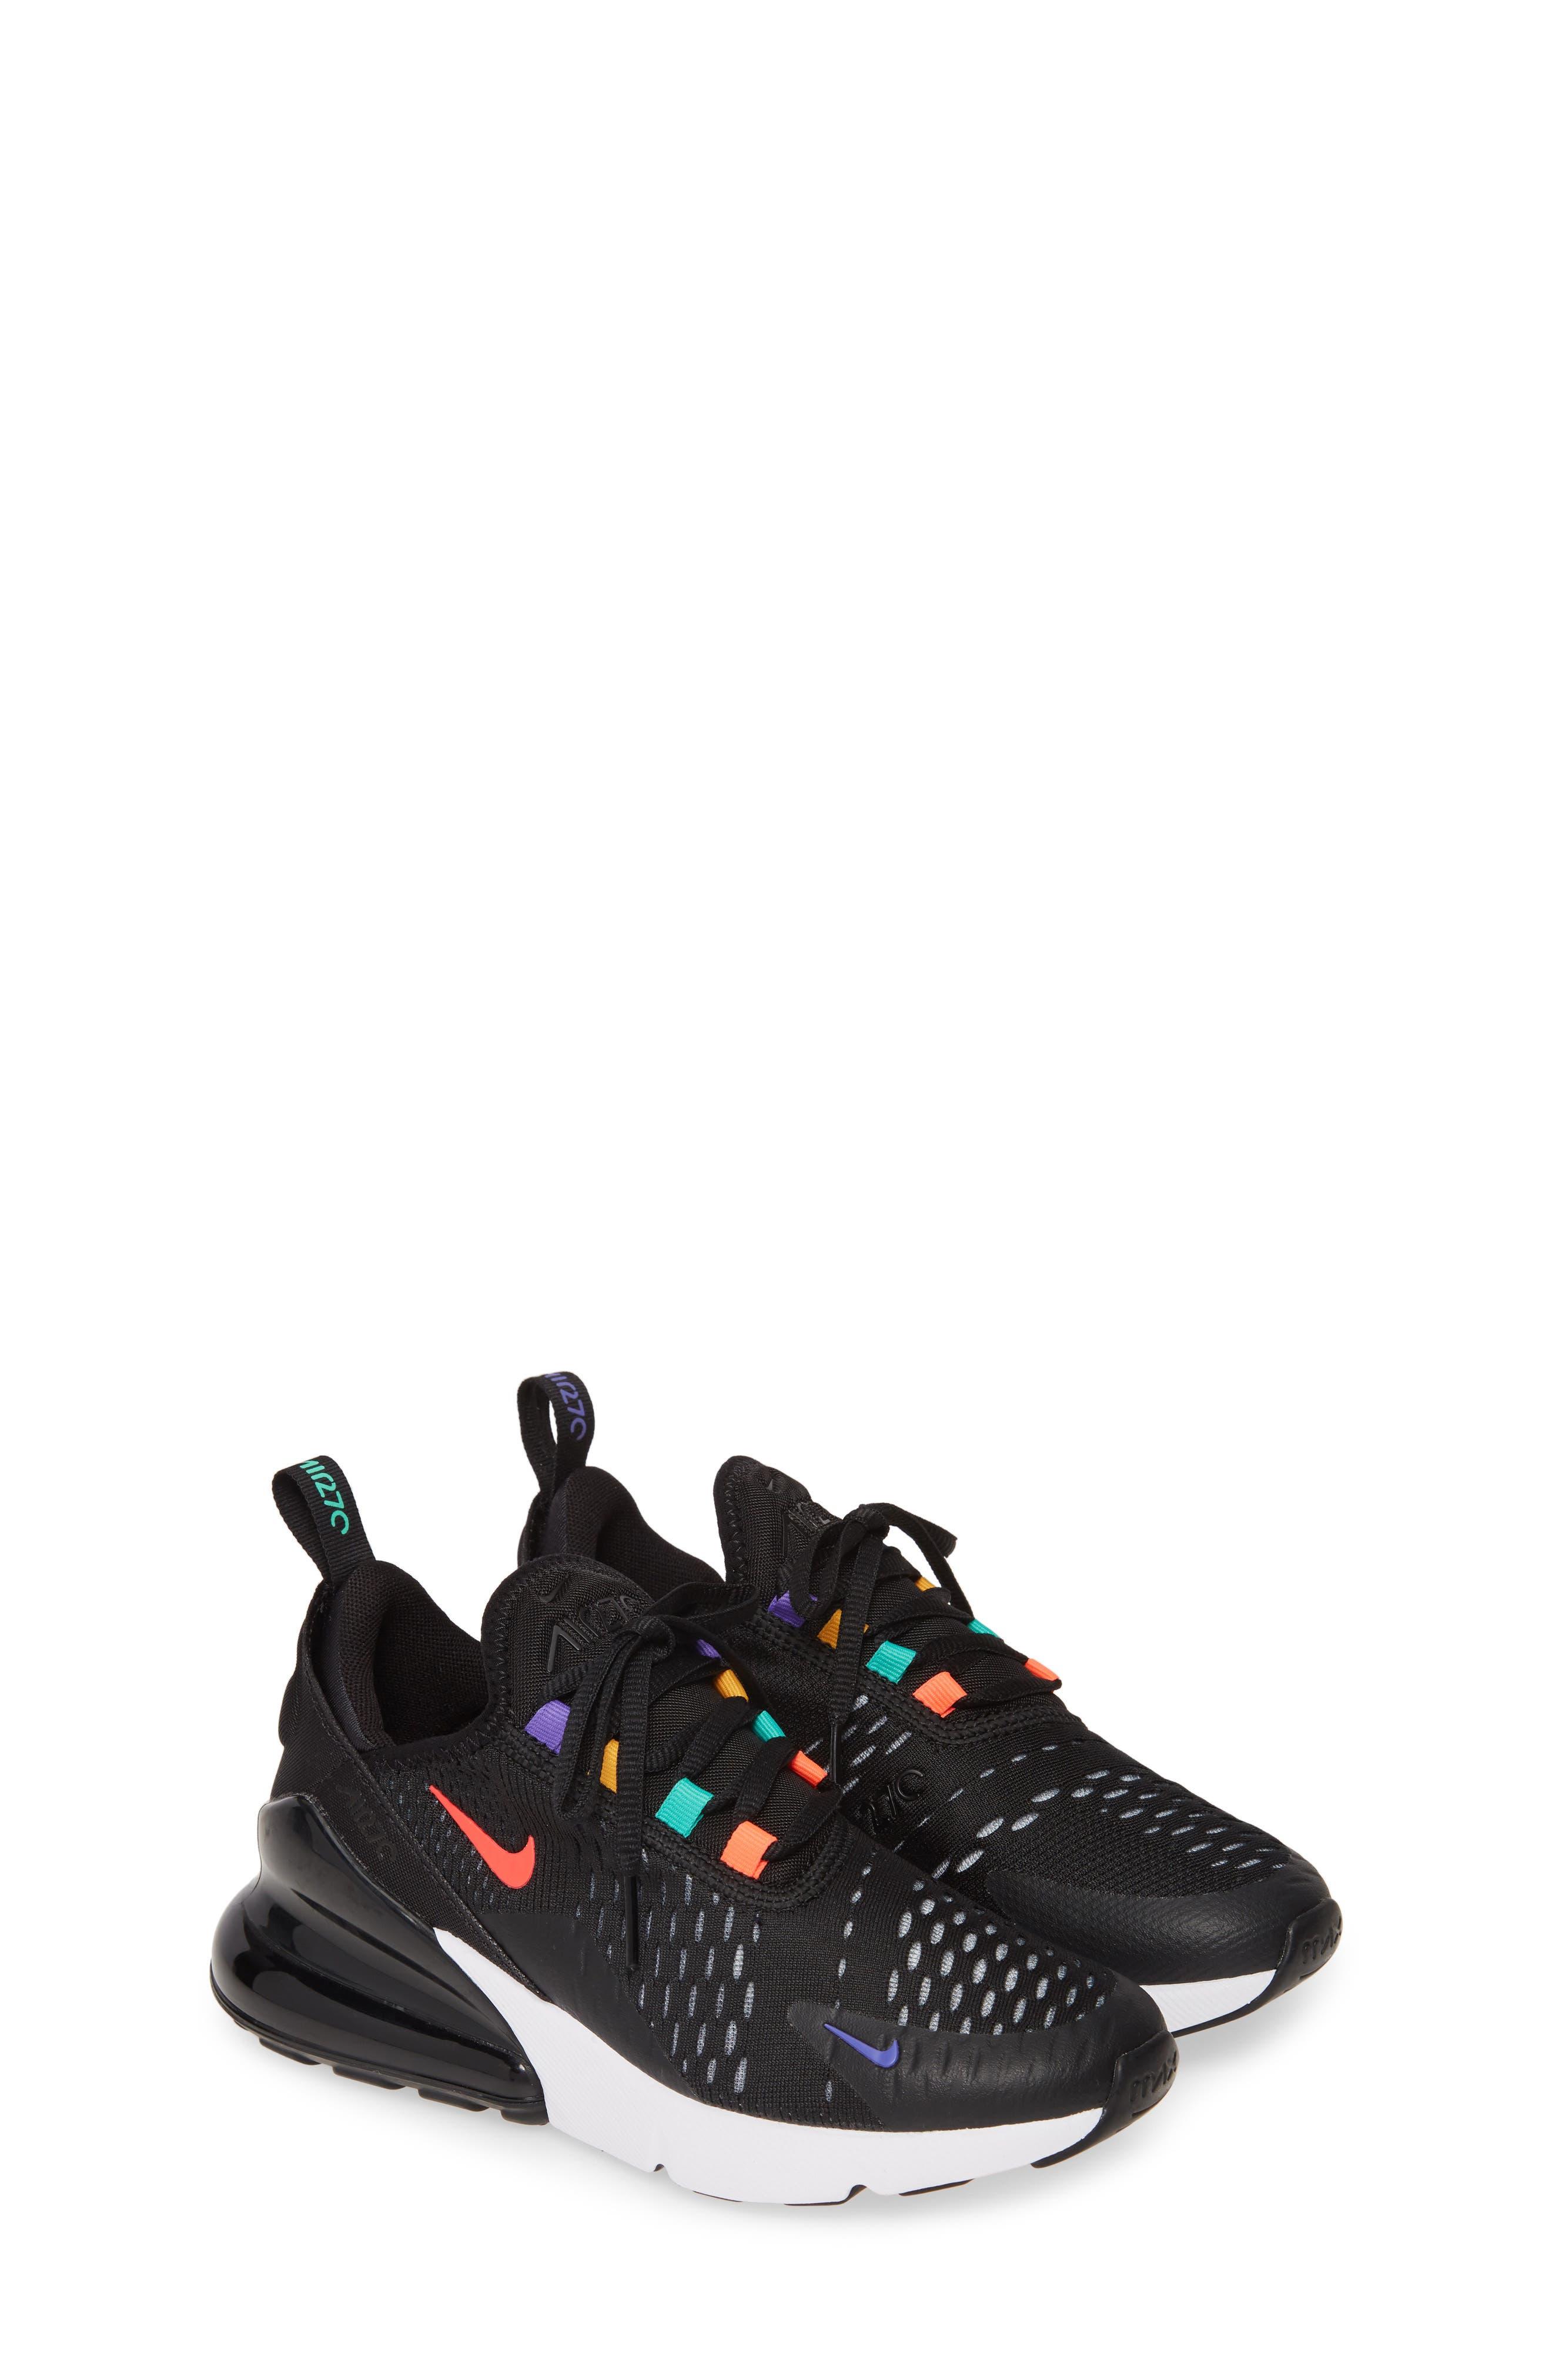 Kids Nike Air Max 270 Game Gs Sneaker Size 4 M  Black